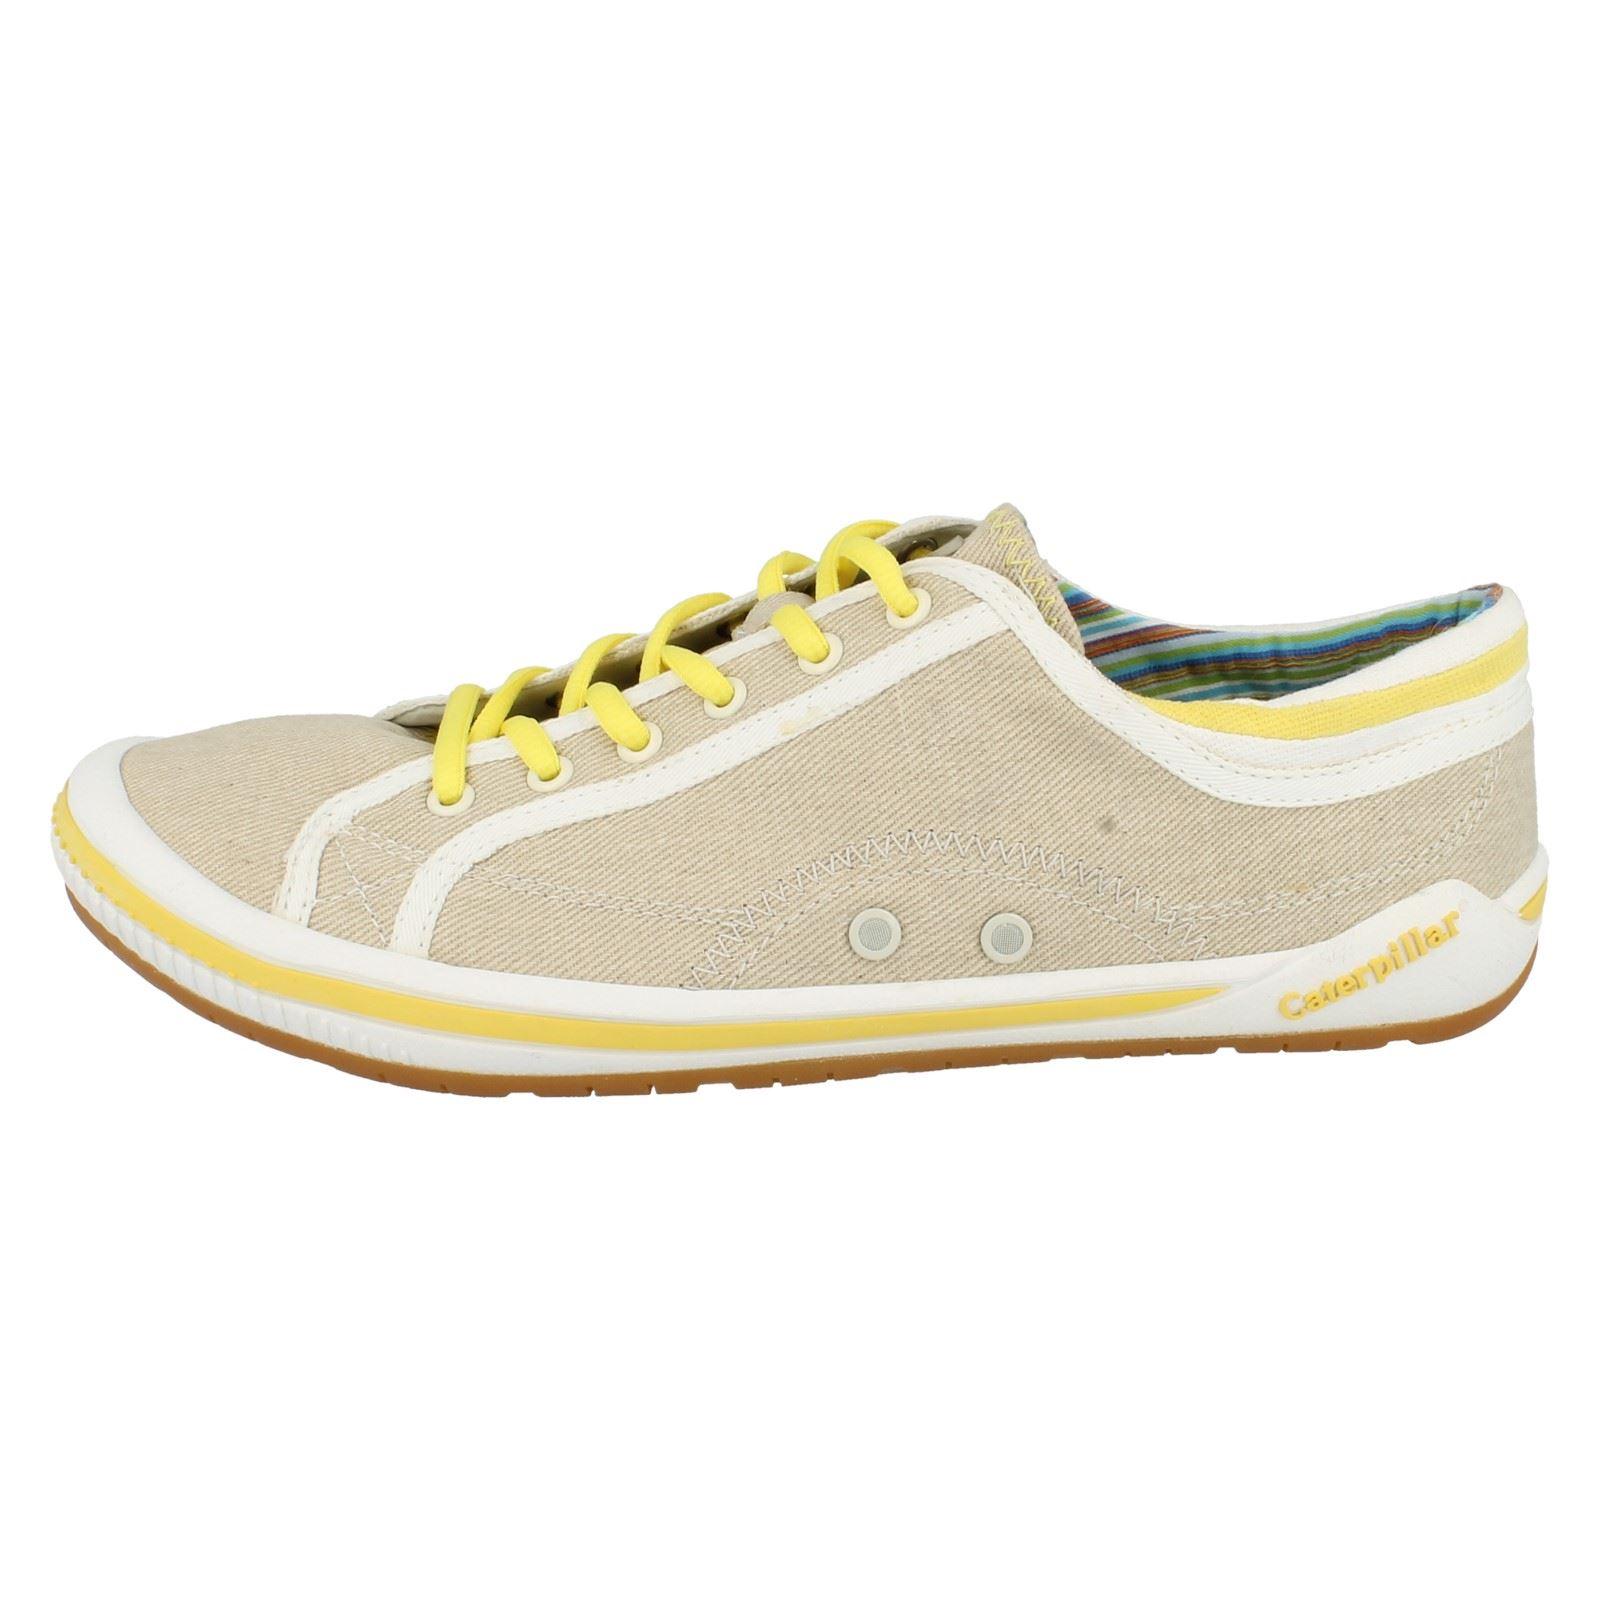 womens caterpillar canvas shoes ebay